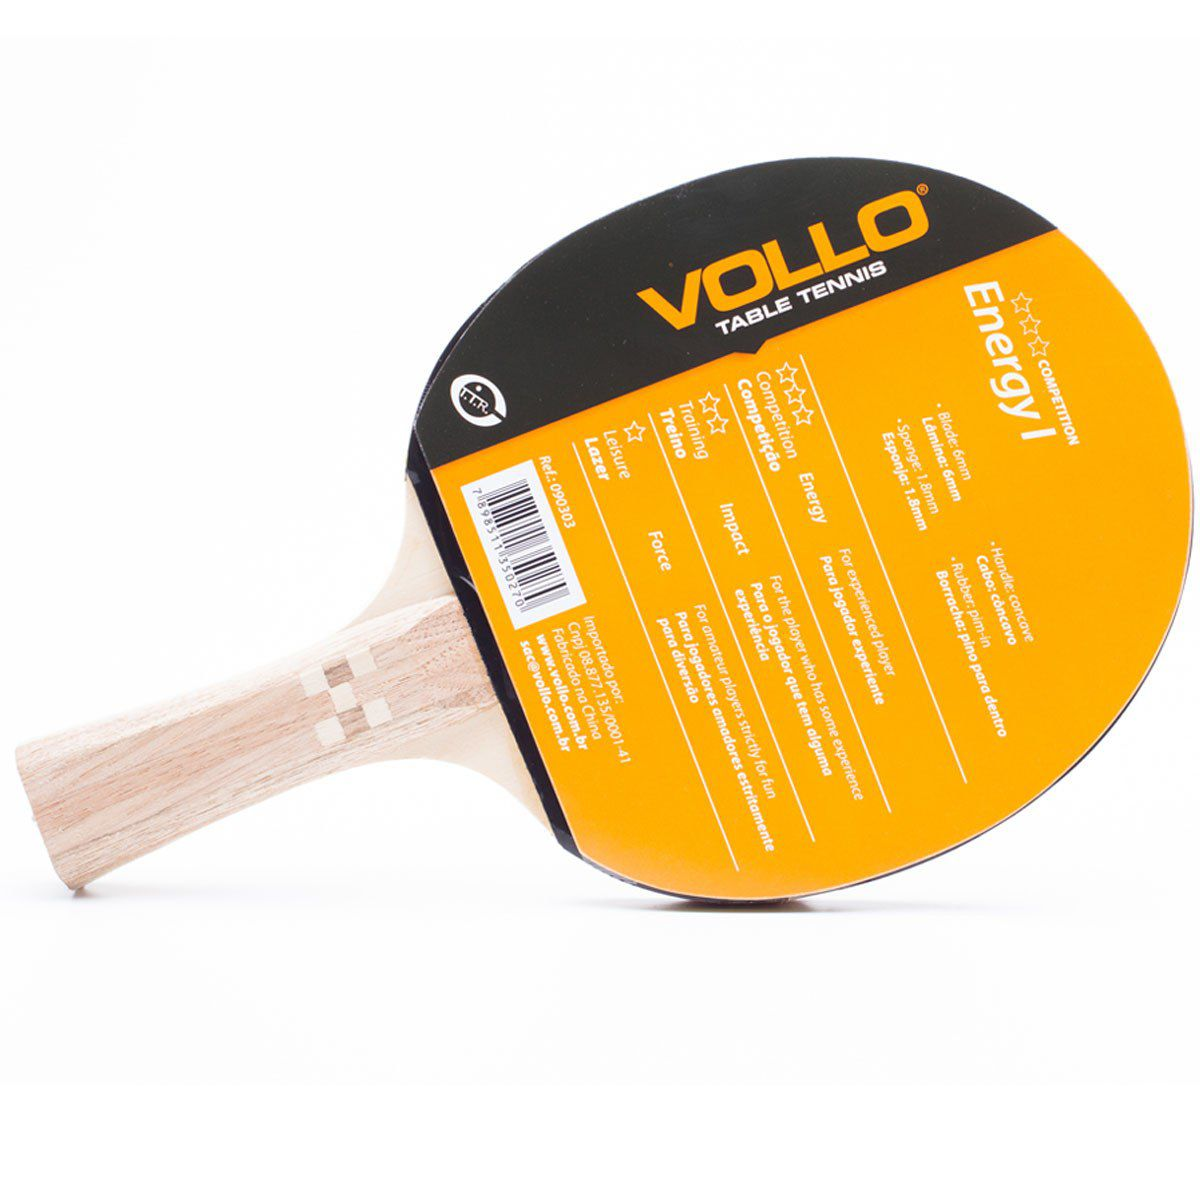 Raquete Tenis de Mesa / Ping Pong - Vollo Energy I - 090303  - Loja do Competidor